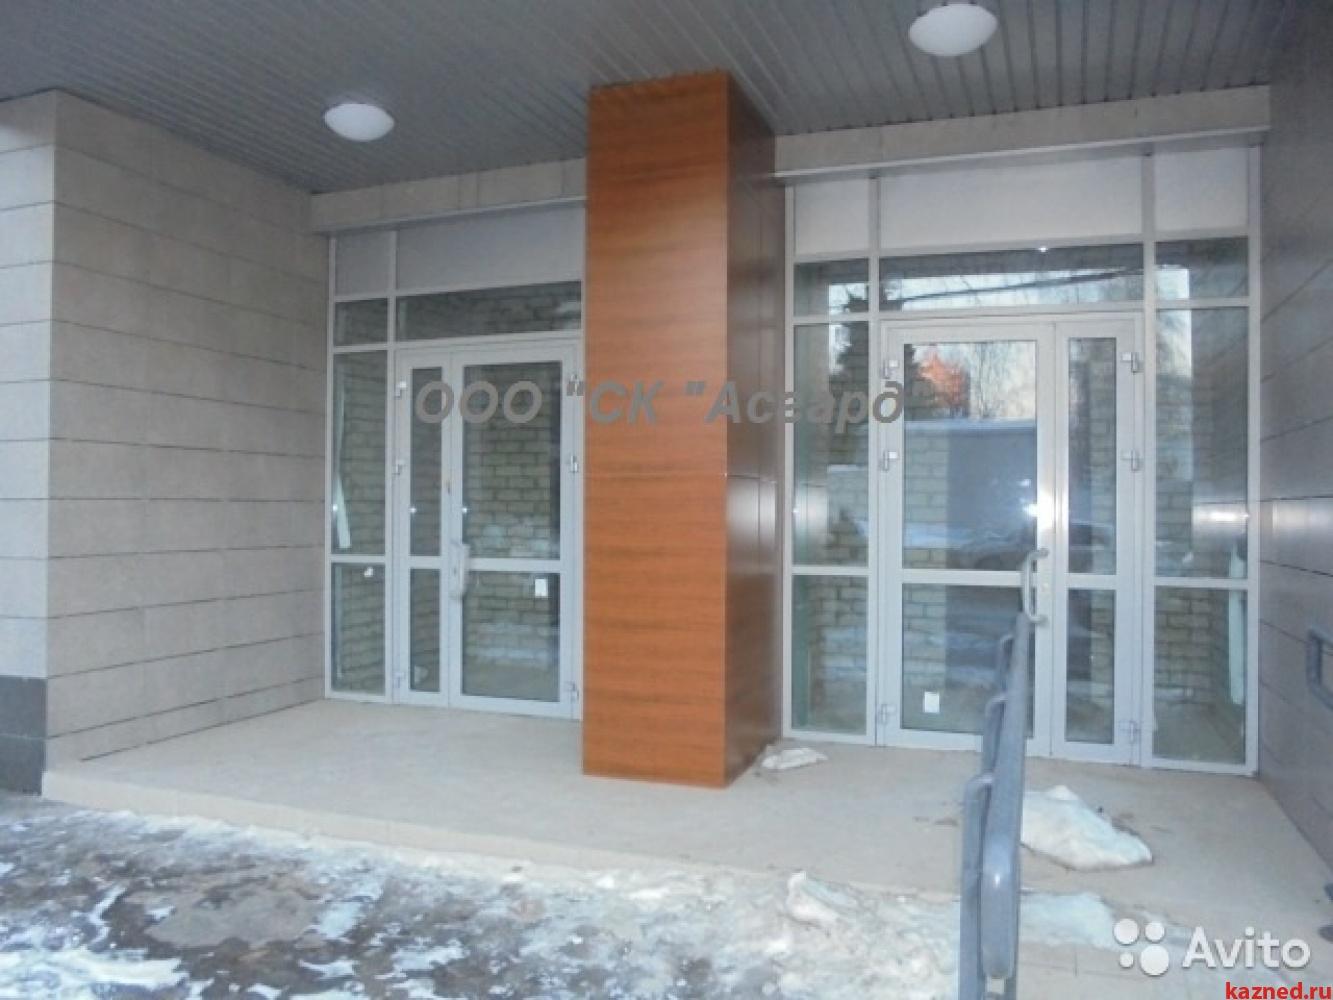 Продажа  офисно-торговые Шуртыгина д.8, 94 м²  (миниатюра №2)